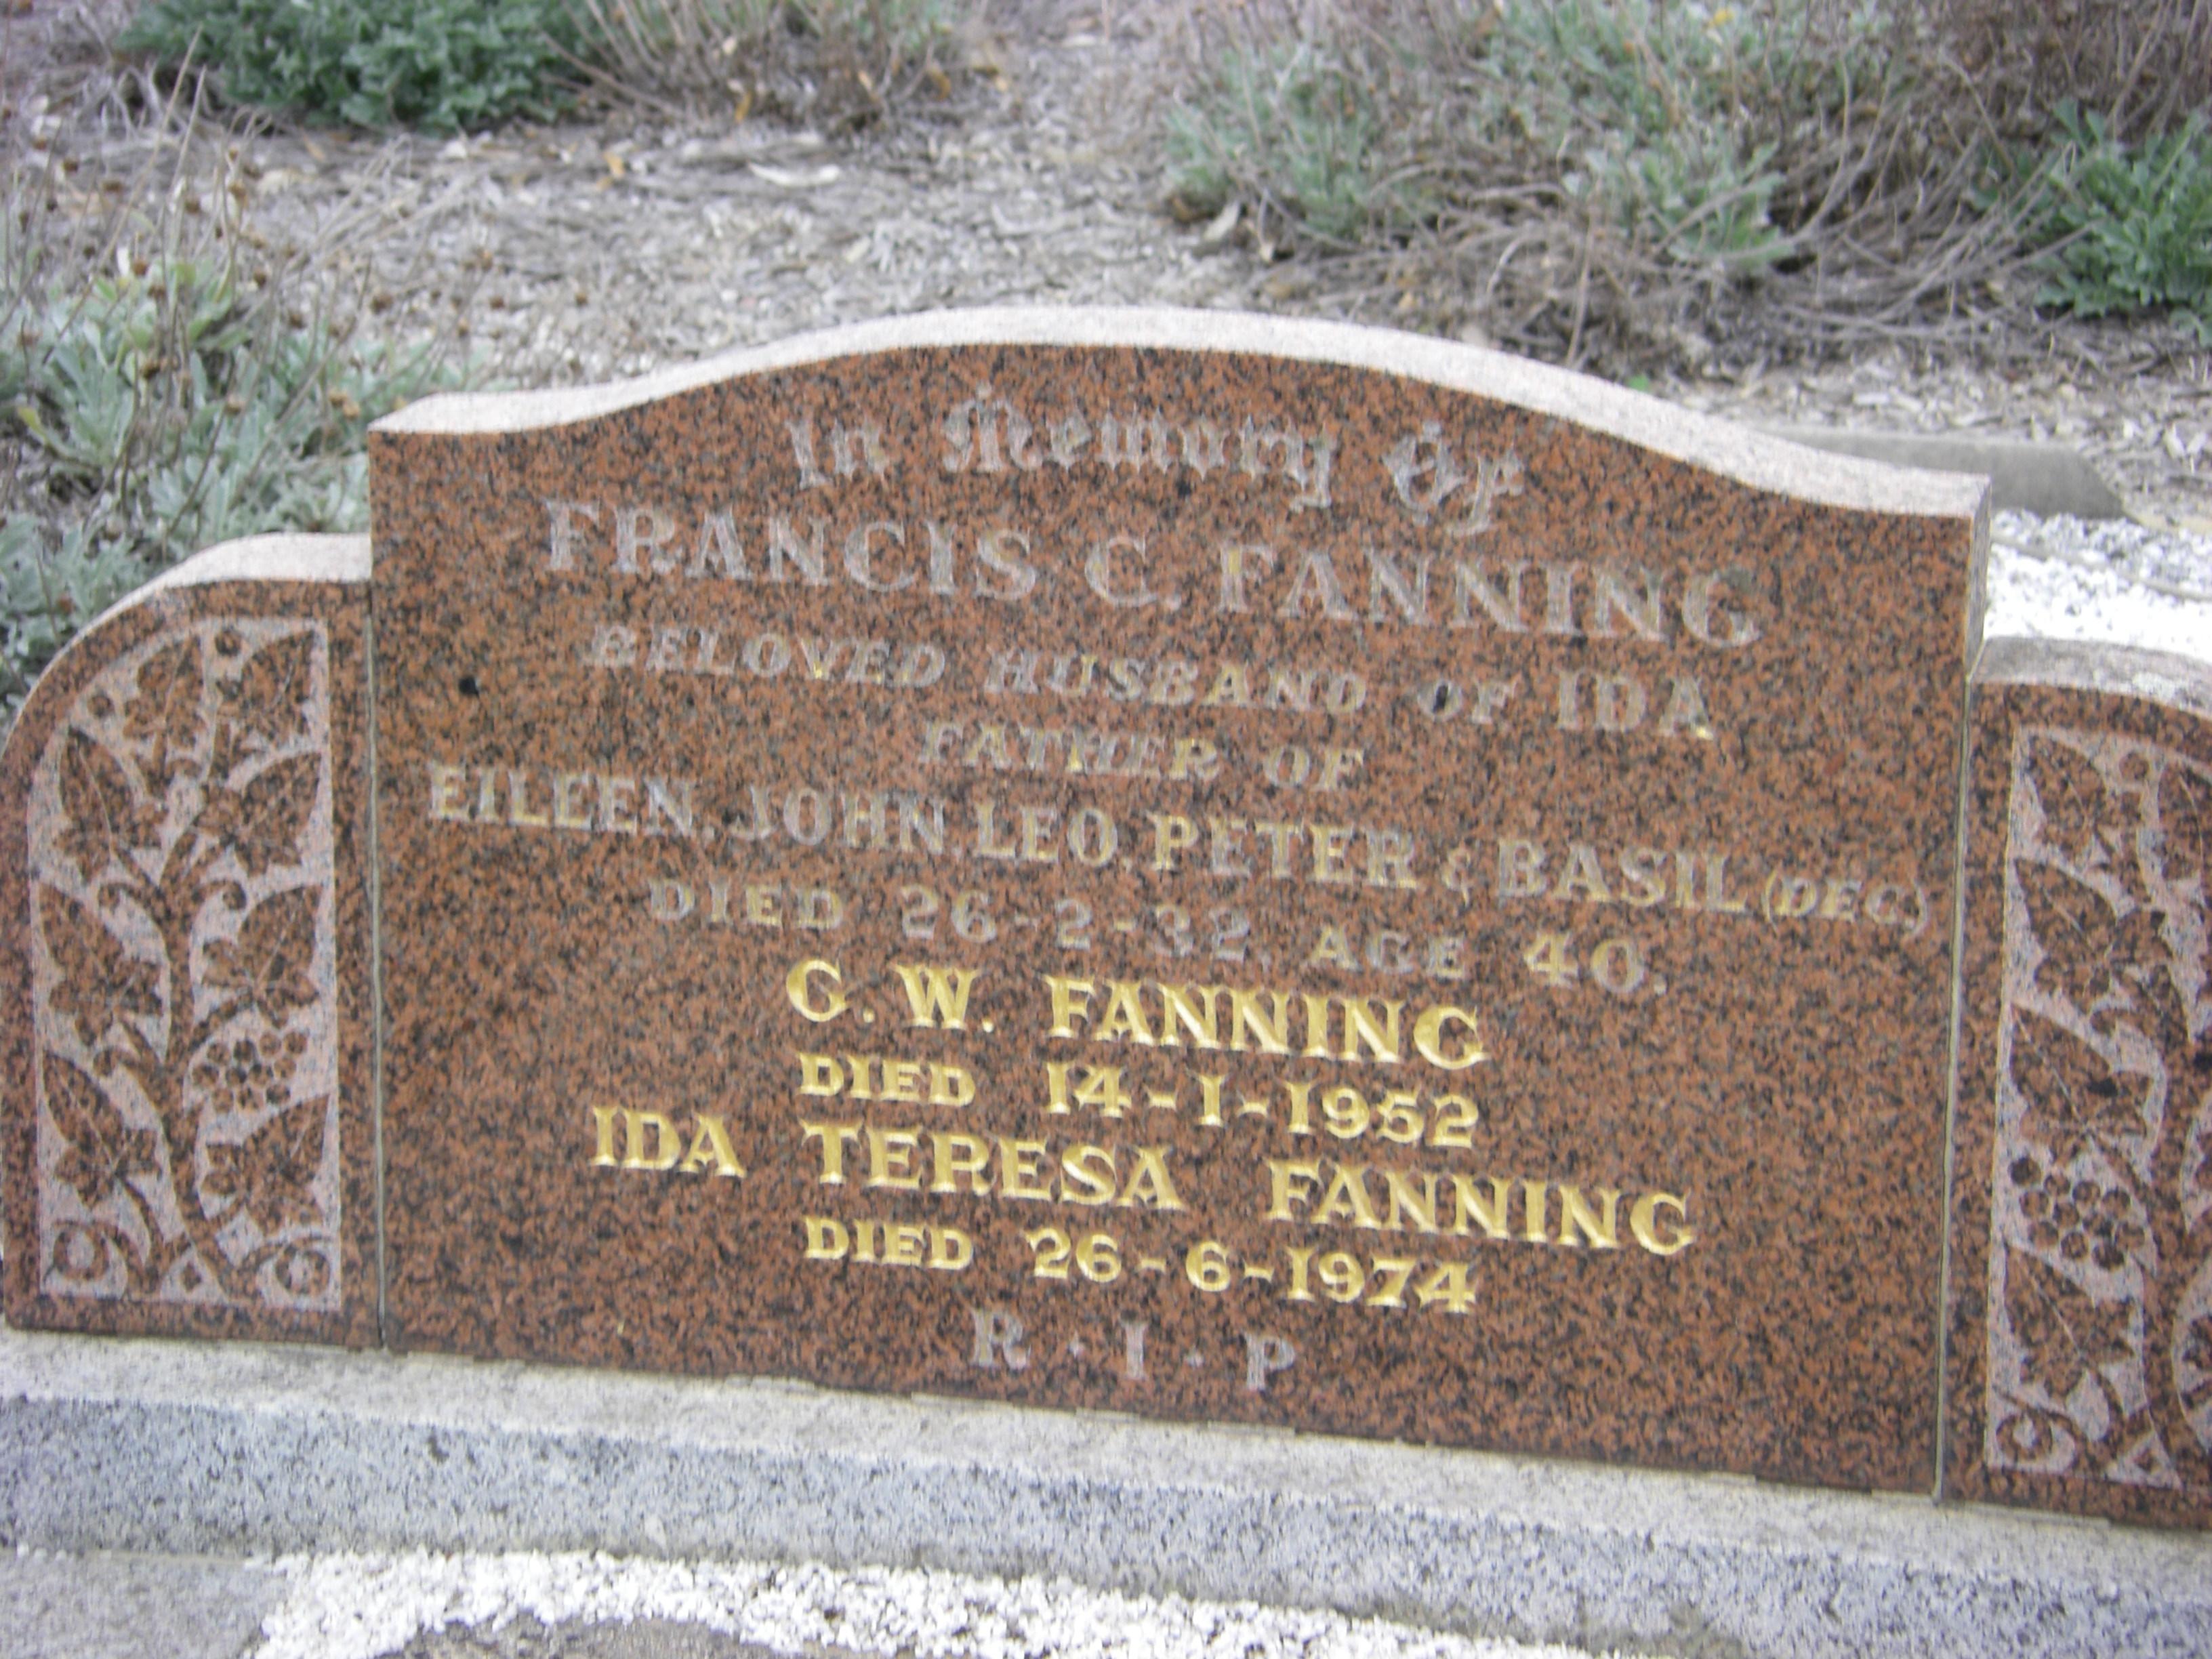 Francis Collins Fanning 1932, Ida Fanning 1974 & G.W. Fanning 1952 Fawkner Cem.